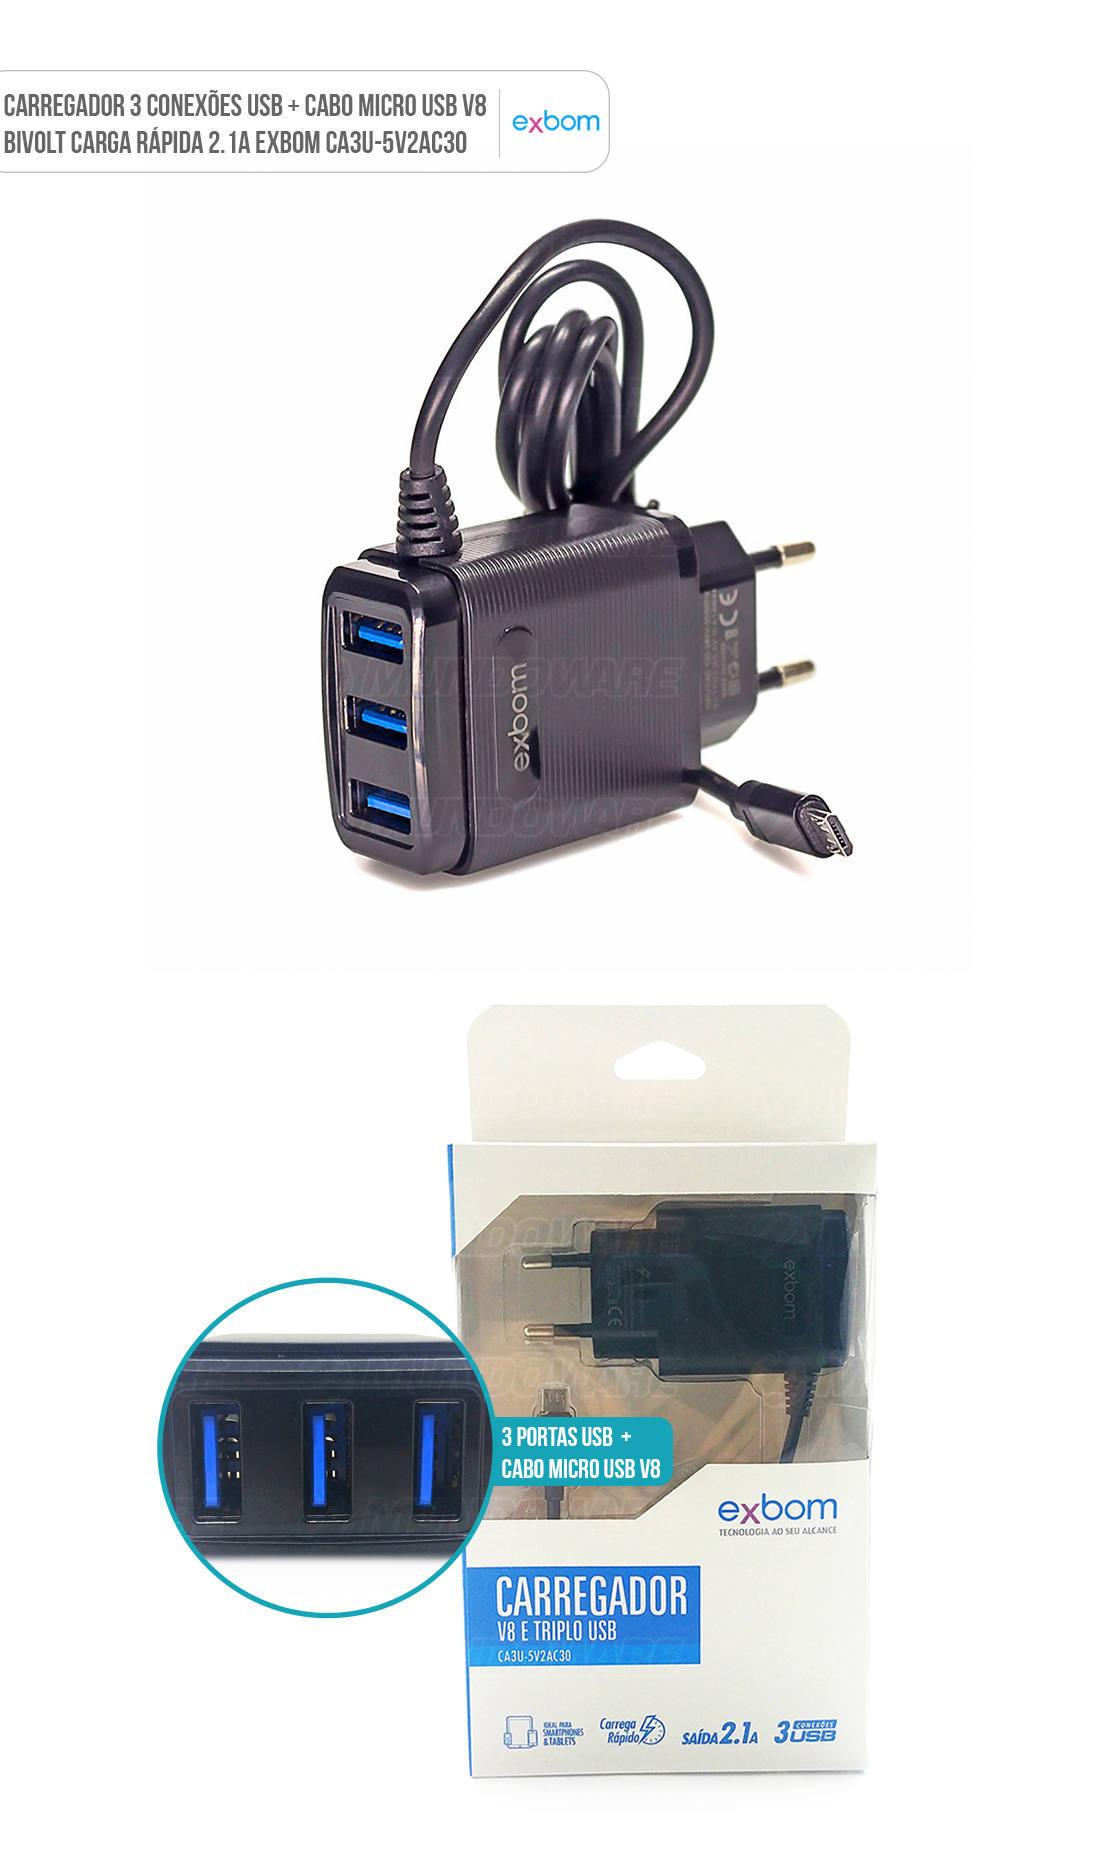 Carregador para Celular de Parede 3 Portas USB Carga Rápida Universal